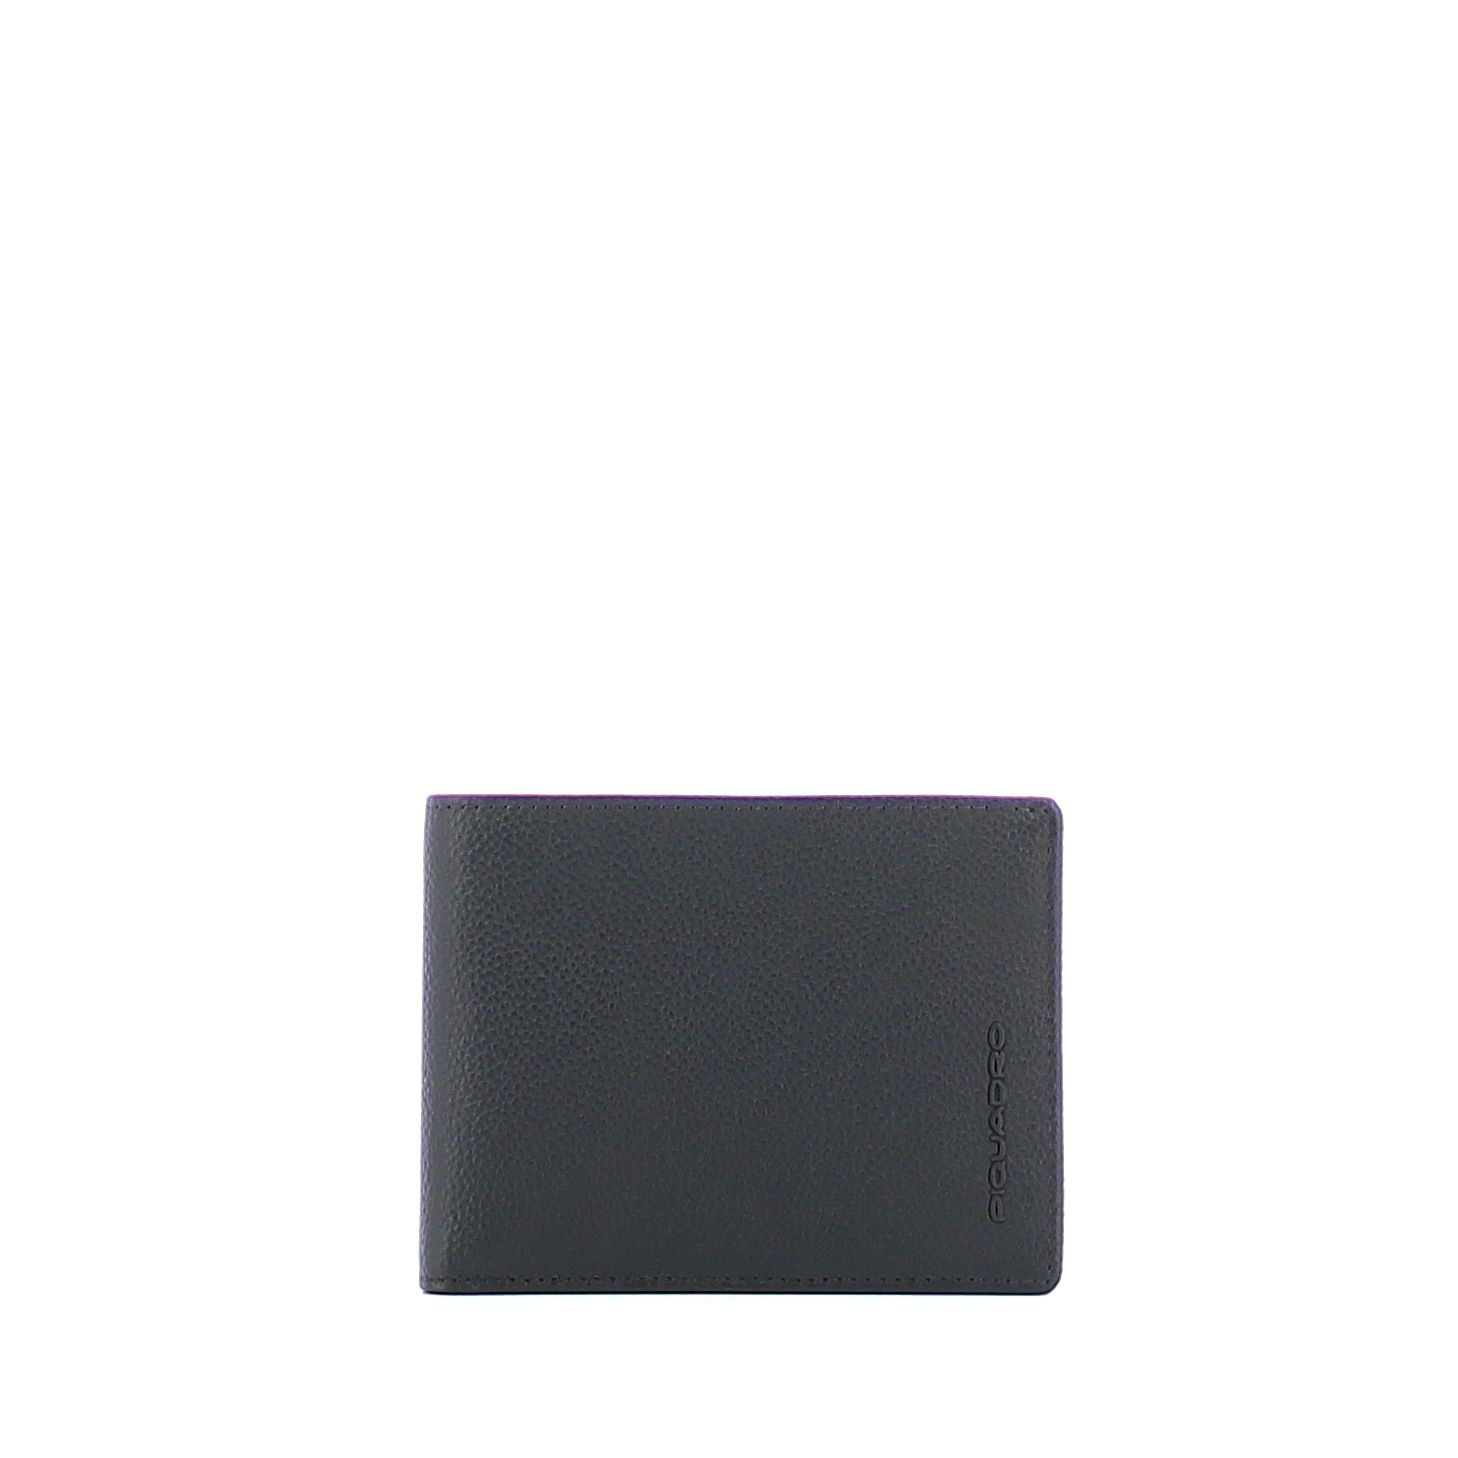 Men Wallet with Credit Card Holder Piquadro BLU/MARRONE